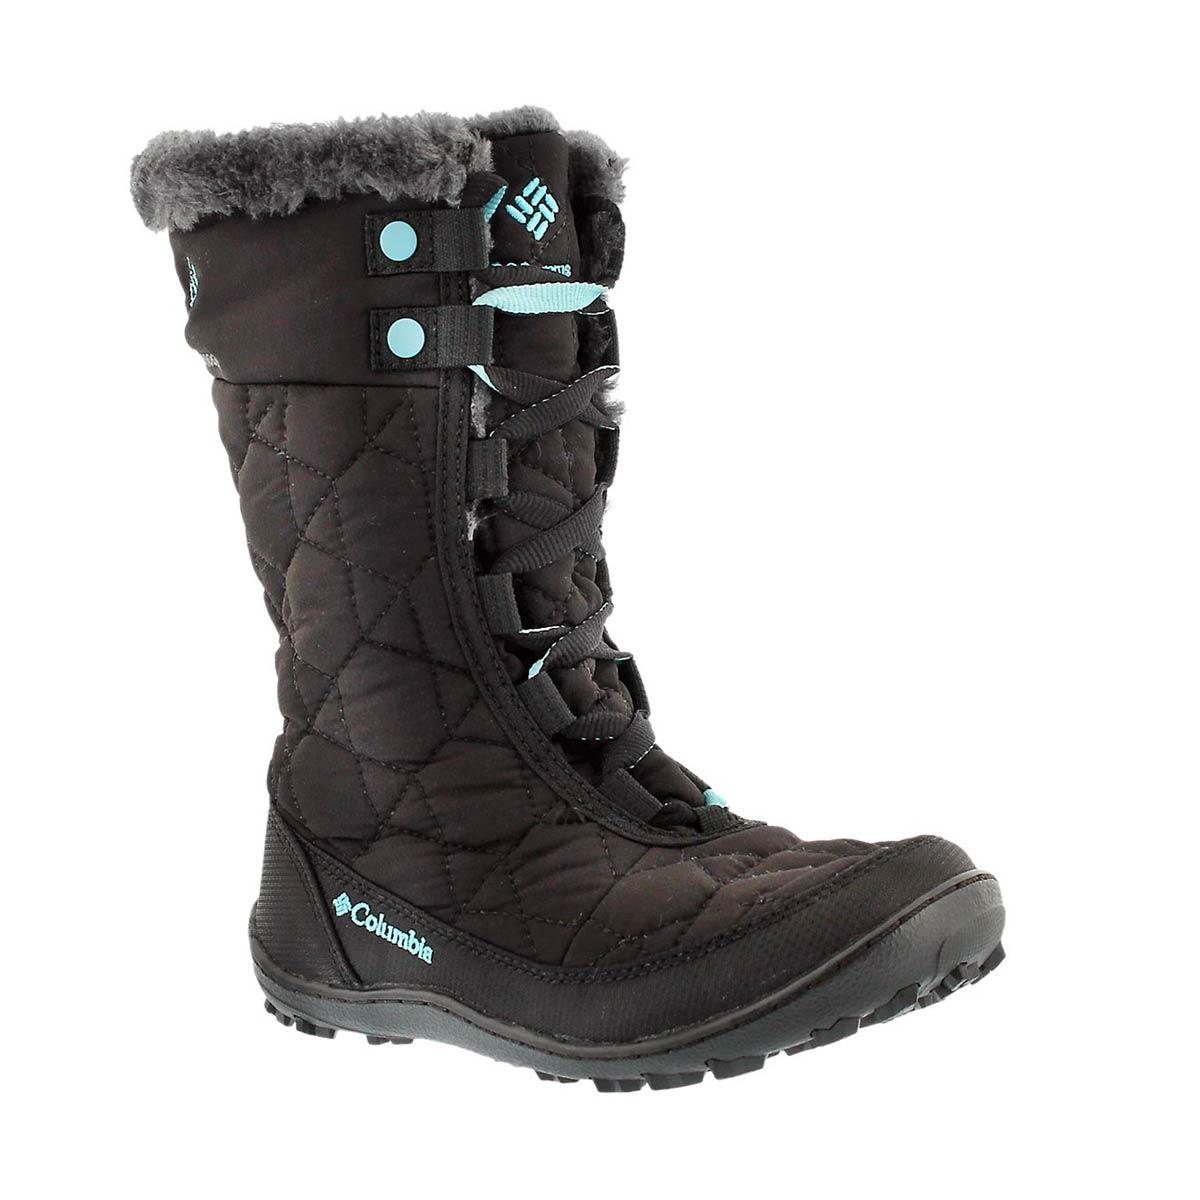 Girls' MINX MID II black winter boots